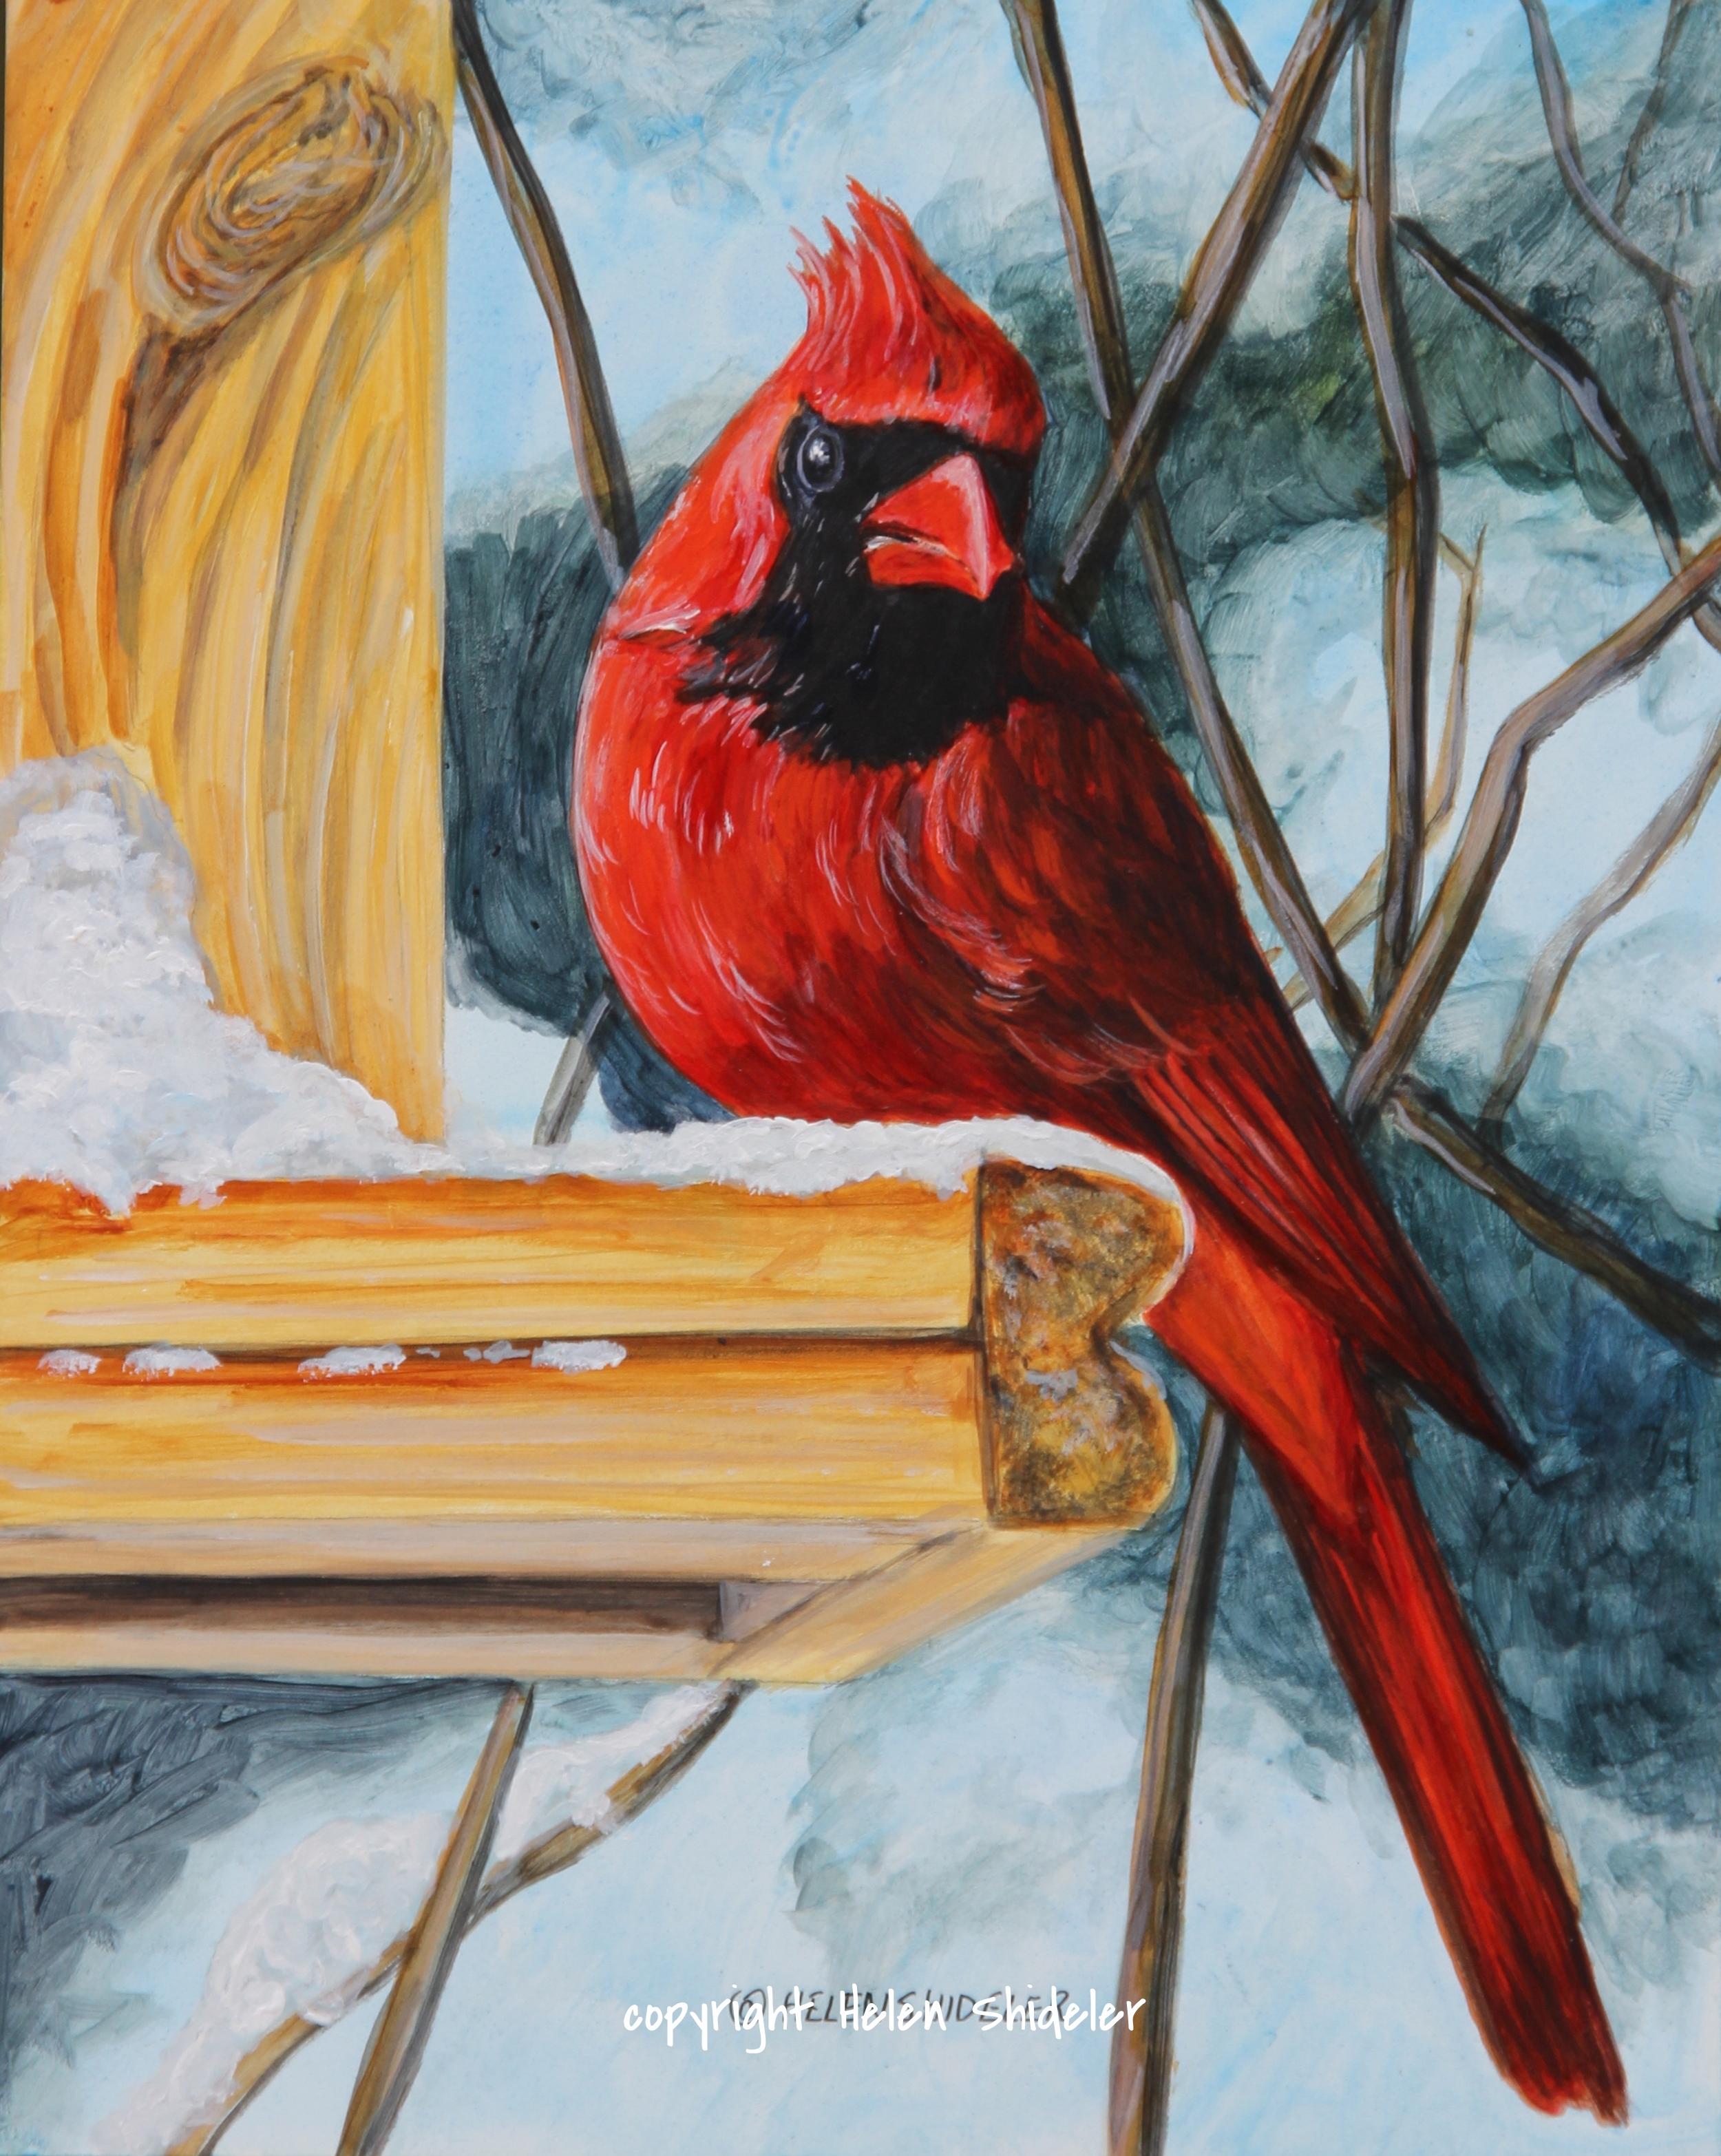 Sweet Memories cardinal painting by Helen Shideler